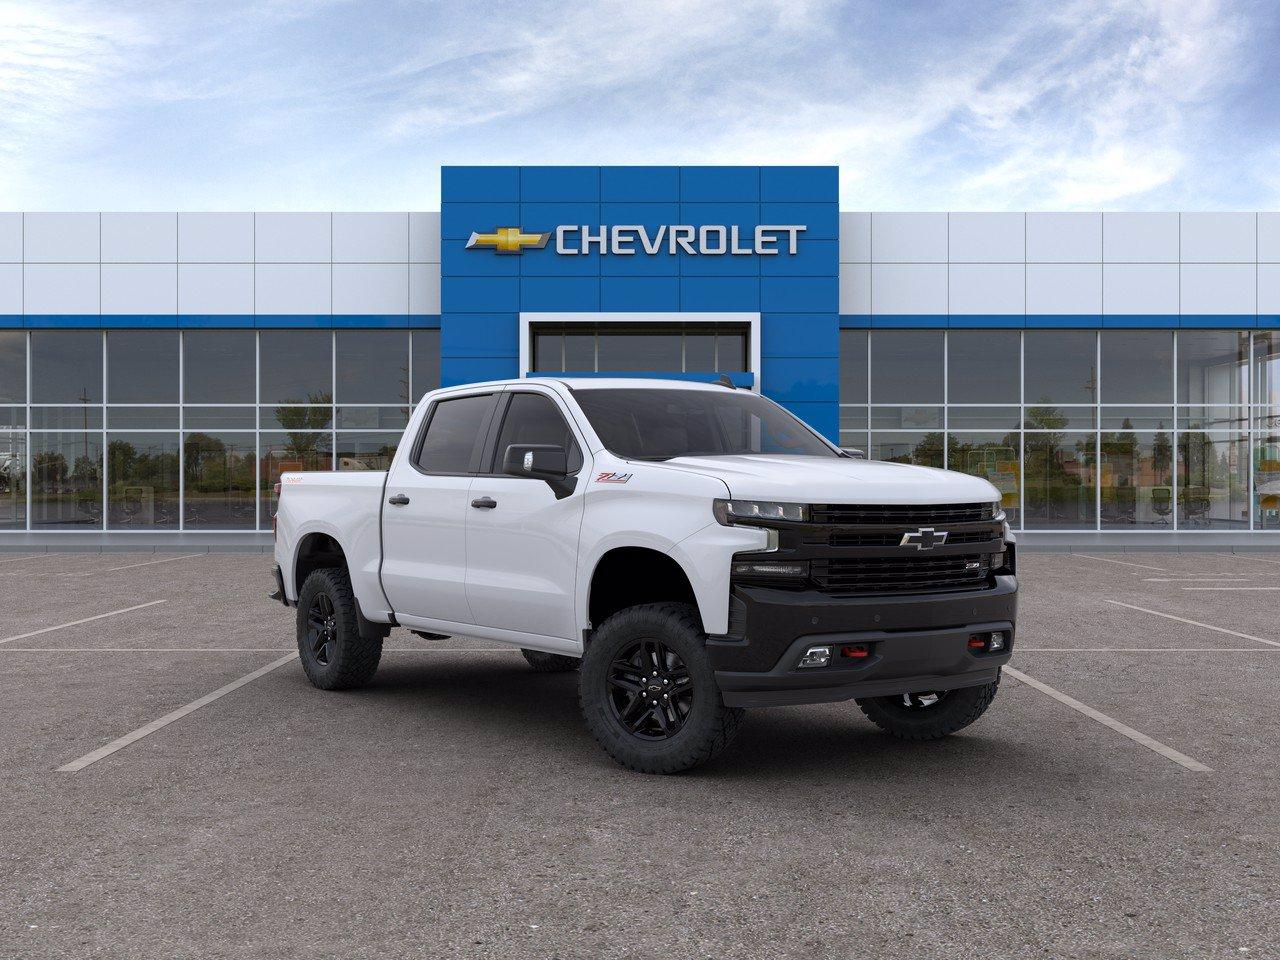 2020 Chevrolet Silverado 1500 Crew Cab 4x4, Pickup #C201673 - photo 1